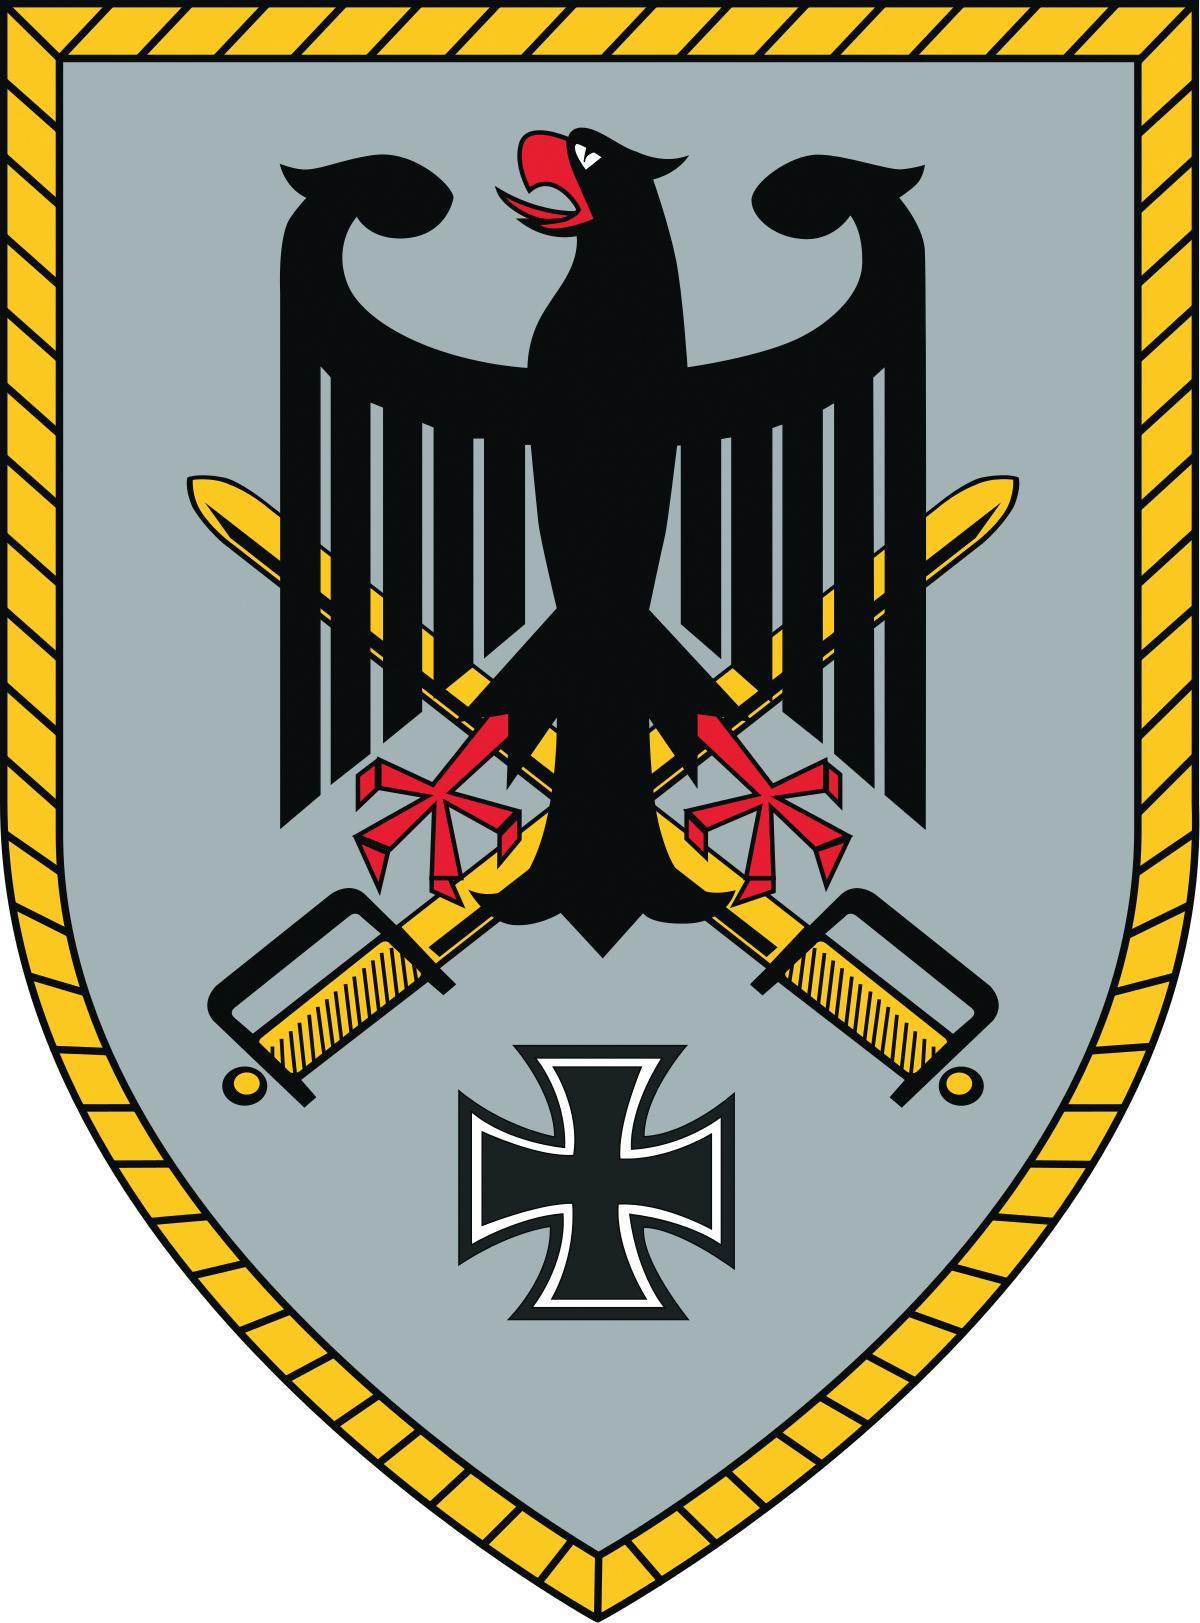 Kommando Heer Abteilung I